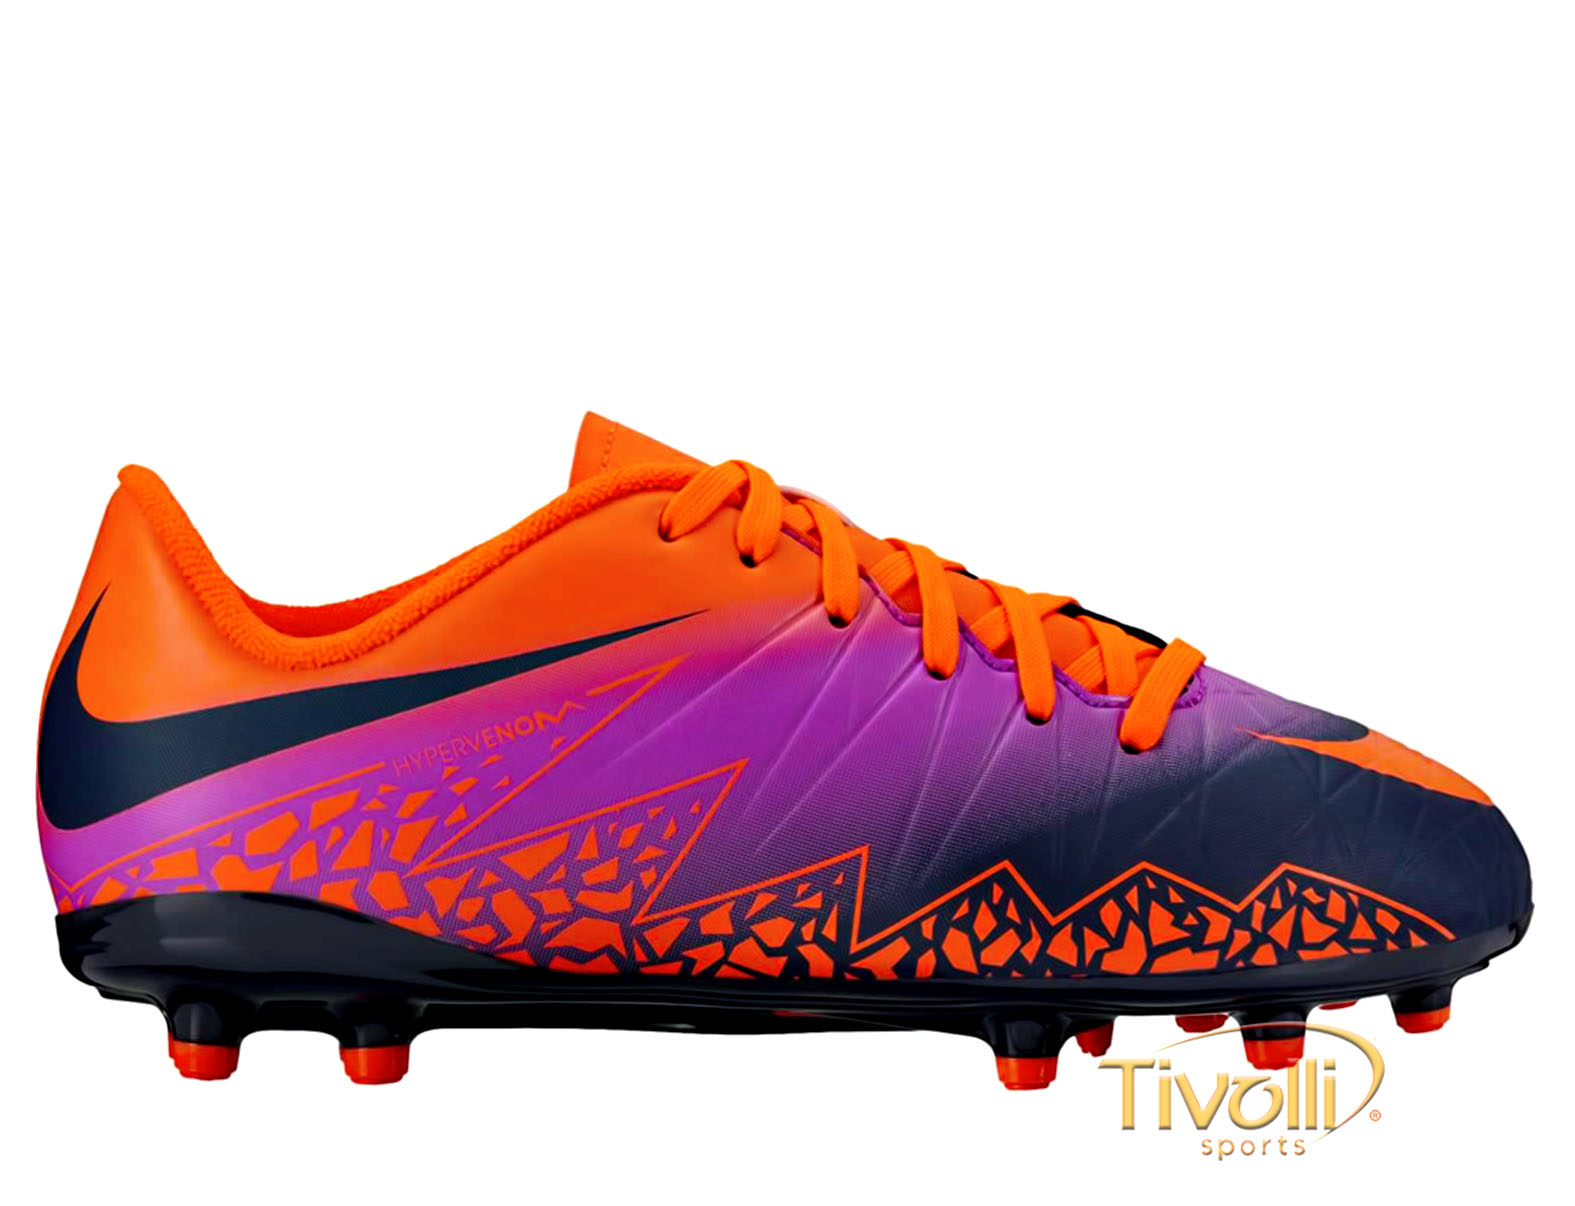 73fcb757c Chuteira Nike Hypervenom Phelon II FG Campo Infantil